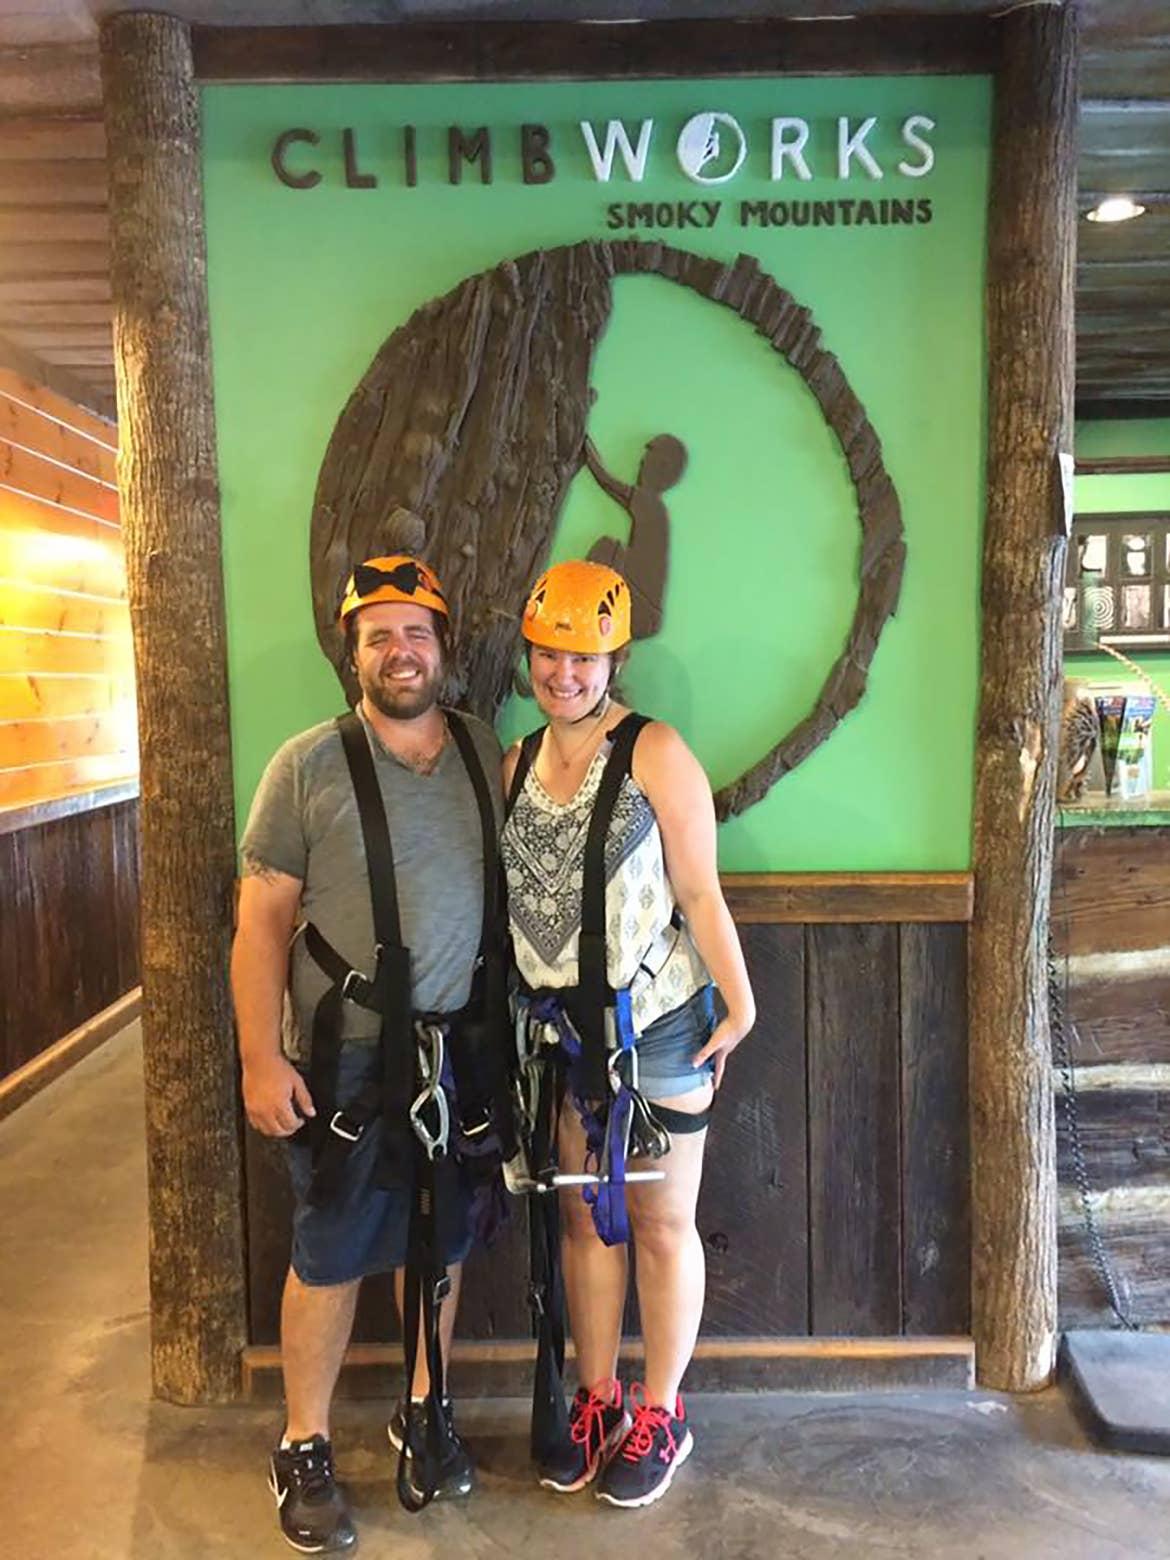 Becca and her husband wearing ziplining gear